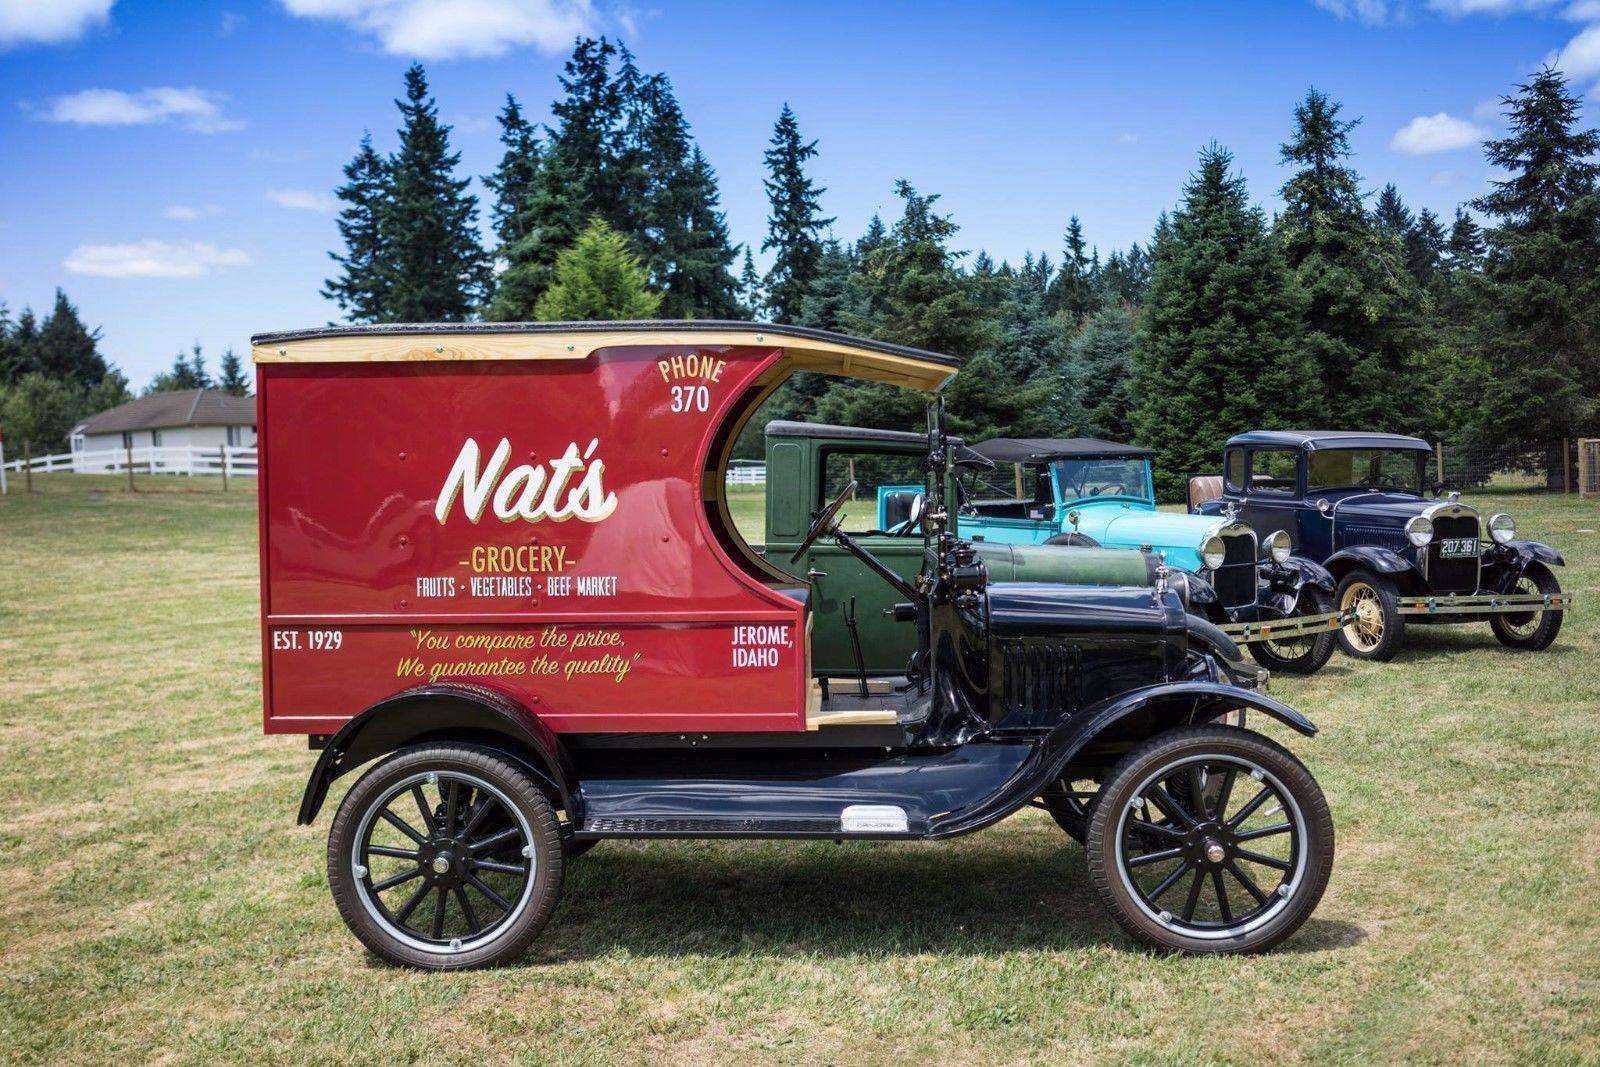 US $4,575.00 New in eBay Motors, Parts & Accessories, Vintage Car ...